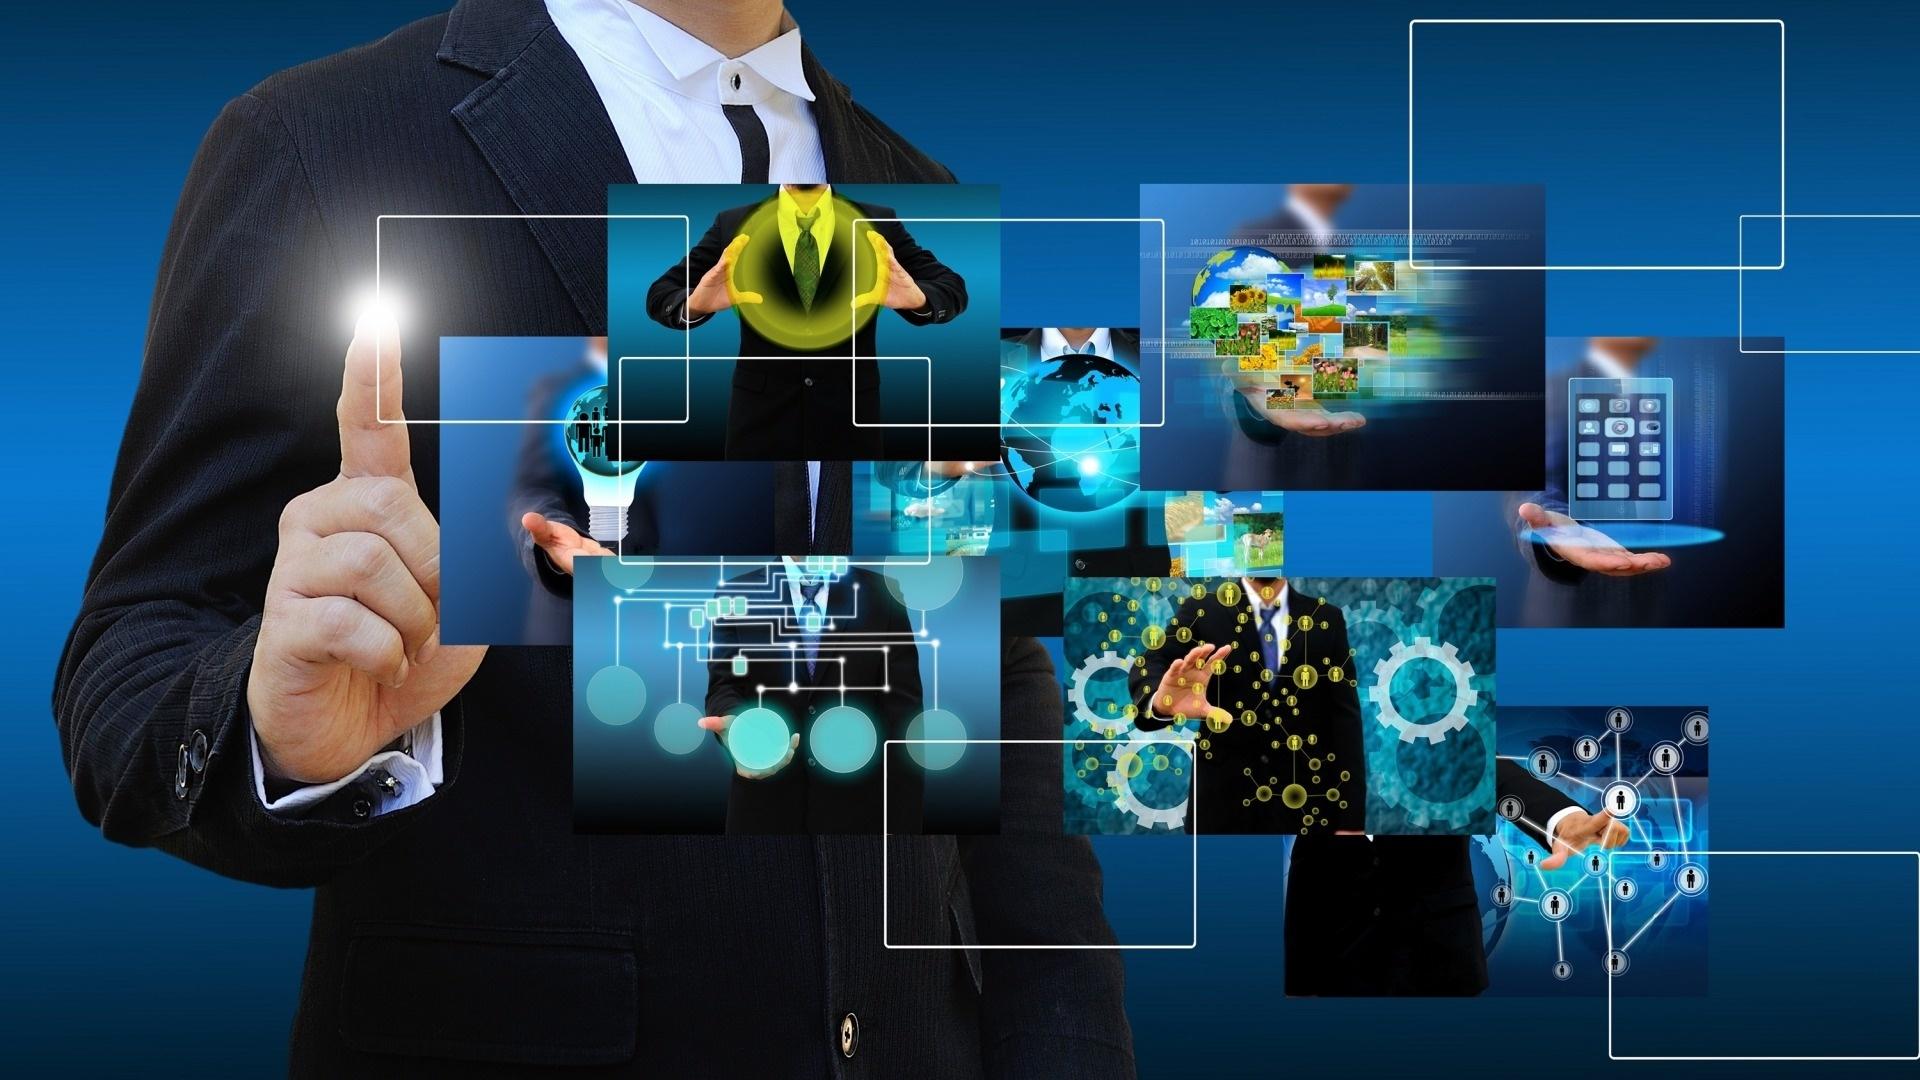 Communication computer wallpaper